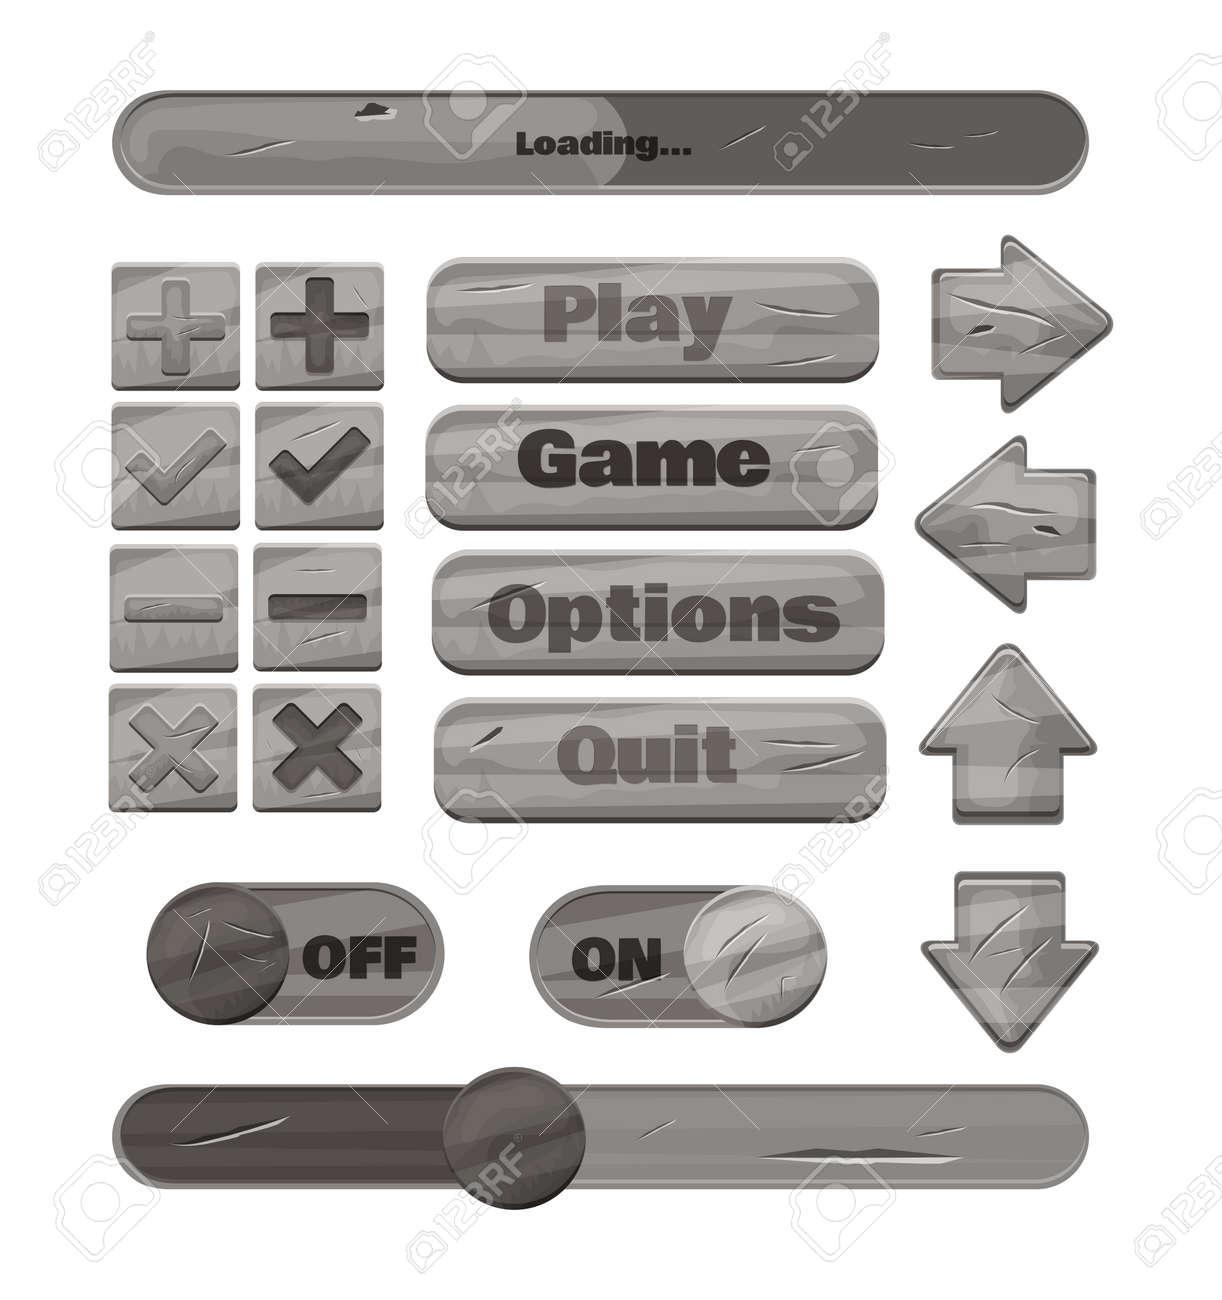 Universal metal UI Kit for designing responsive gaming applications